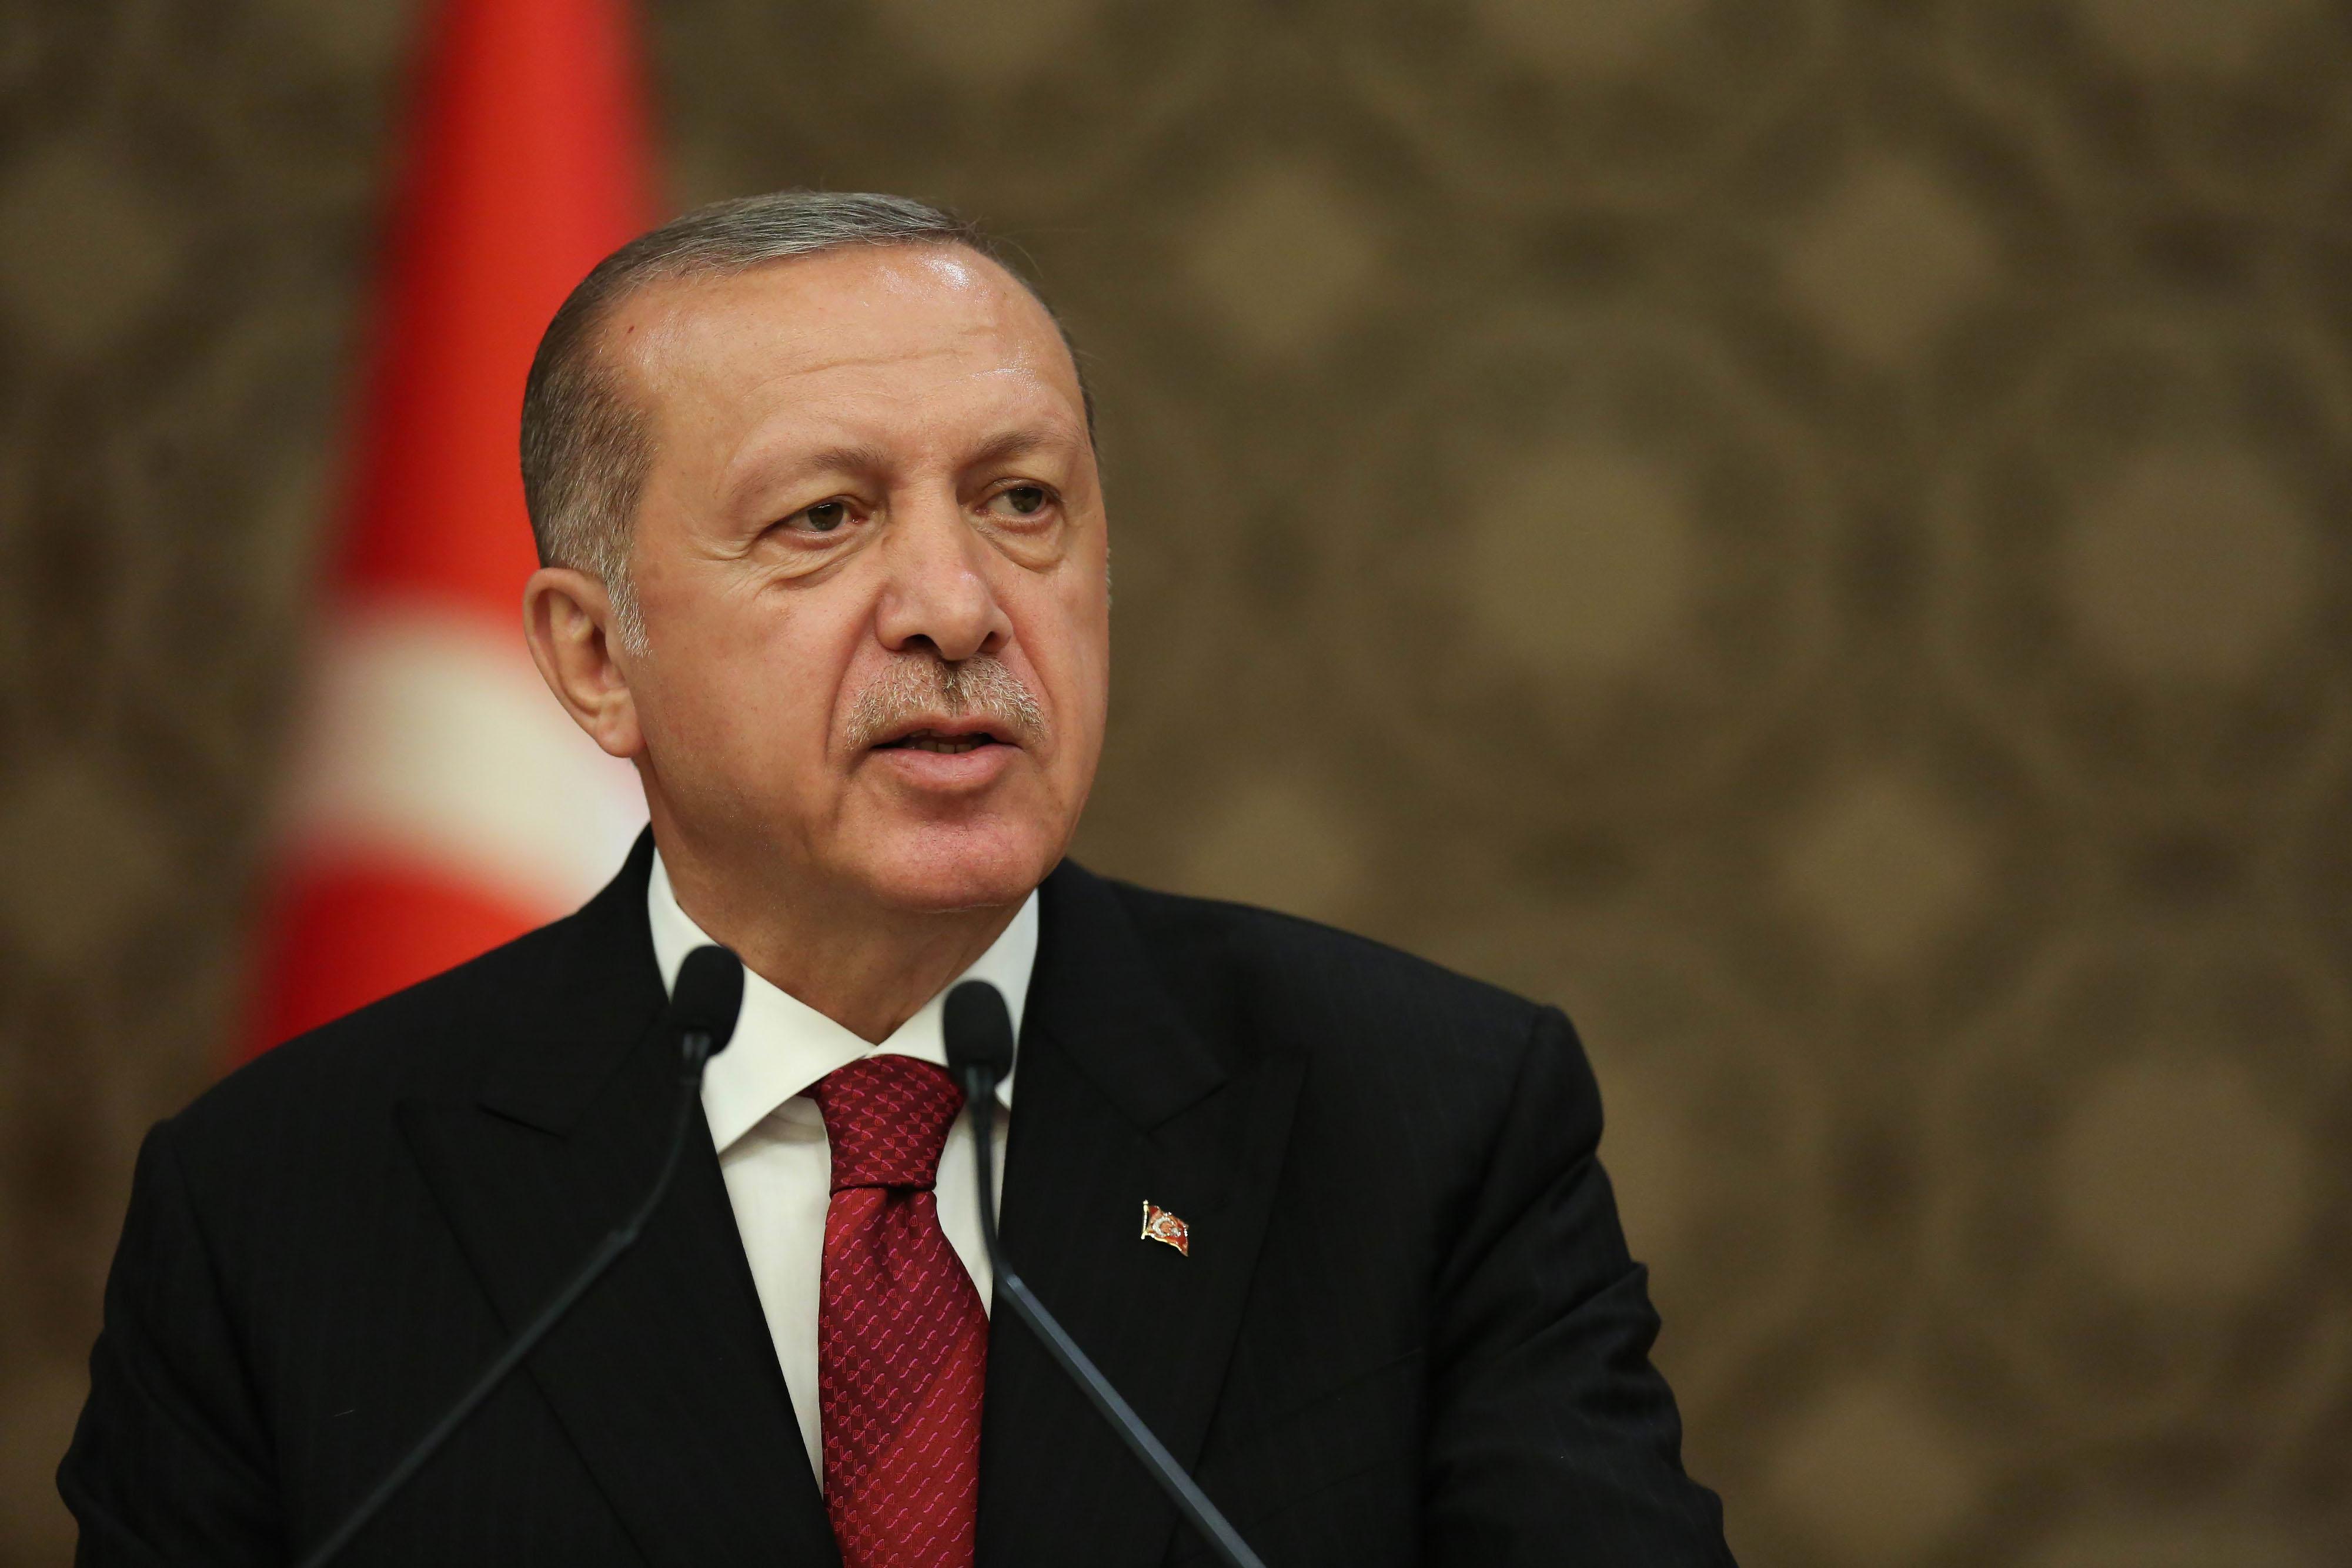 Turkish President Recep Tayyip Erdogan at the Presidential palace in Ankara, Turkey, on July 9, 2018. MUST CREDIT: Bloomberg photo by Arif Akdogan.